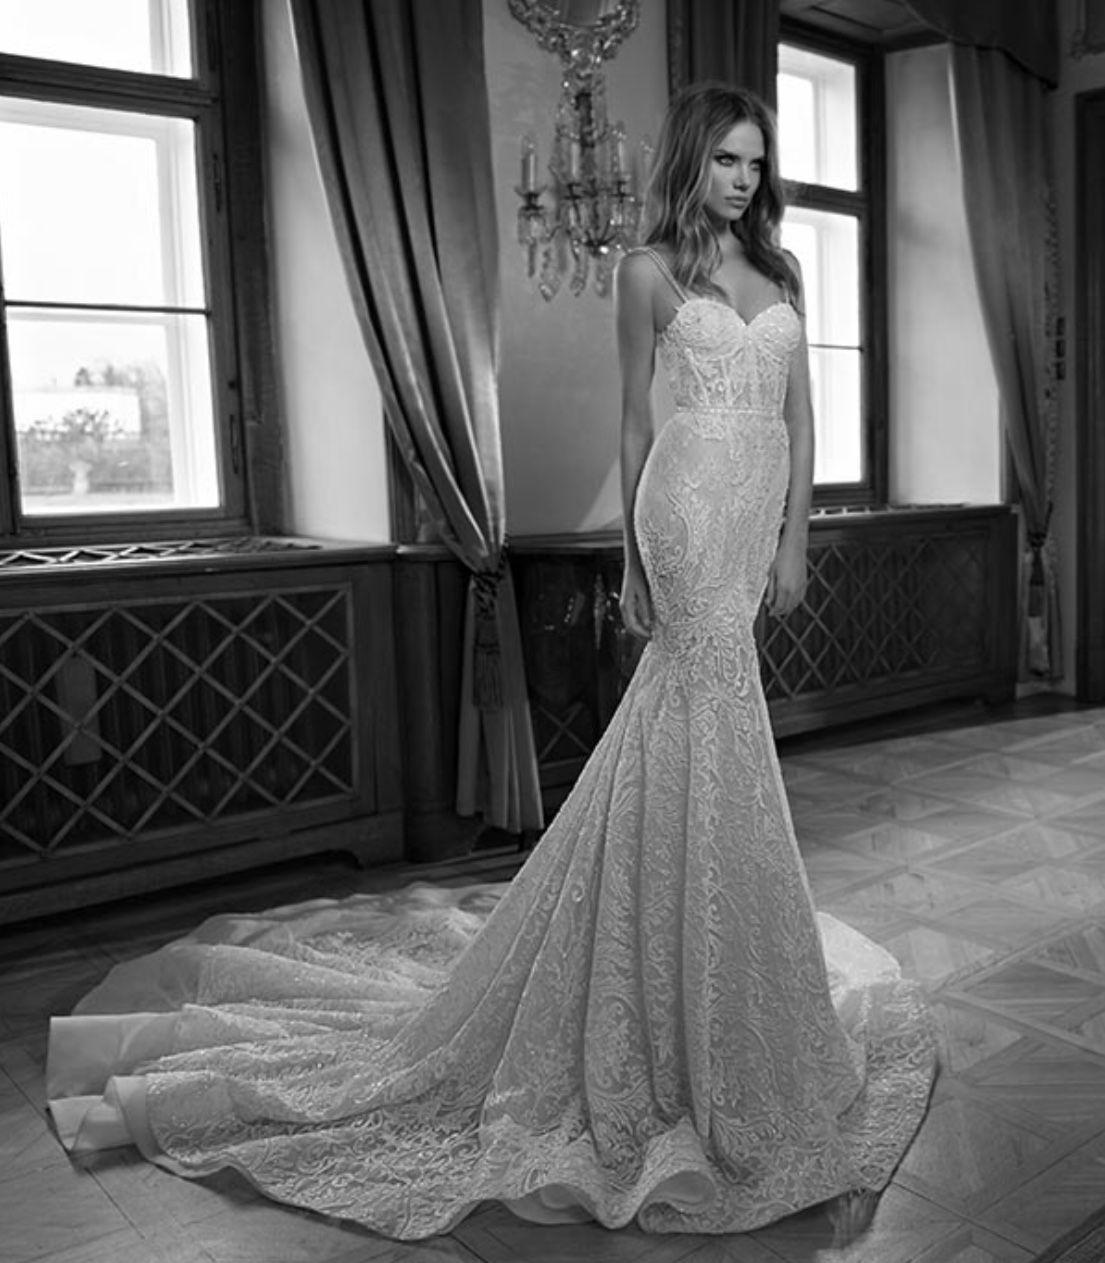 Berta 15 110 Wedding Dress Used, Size 14, 7,500